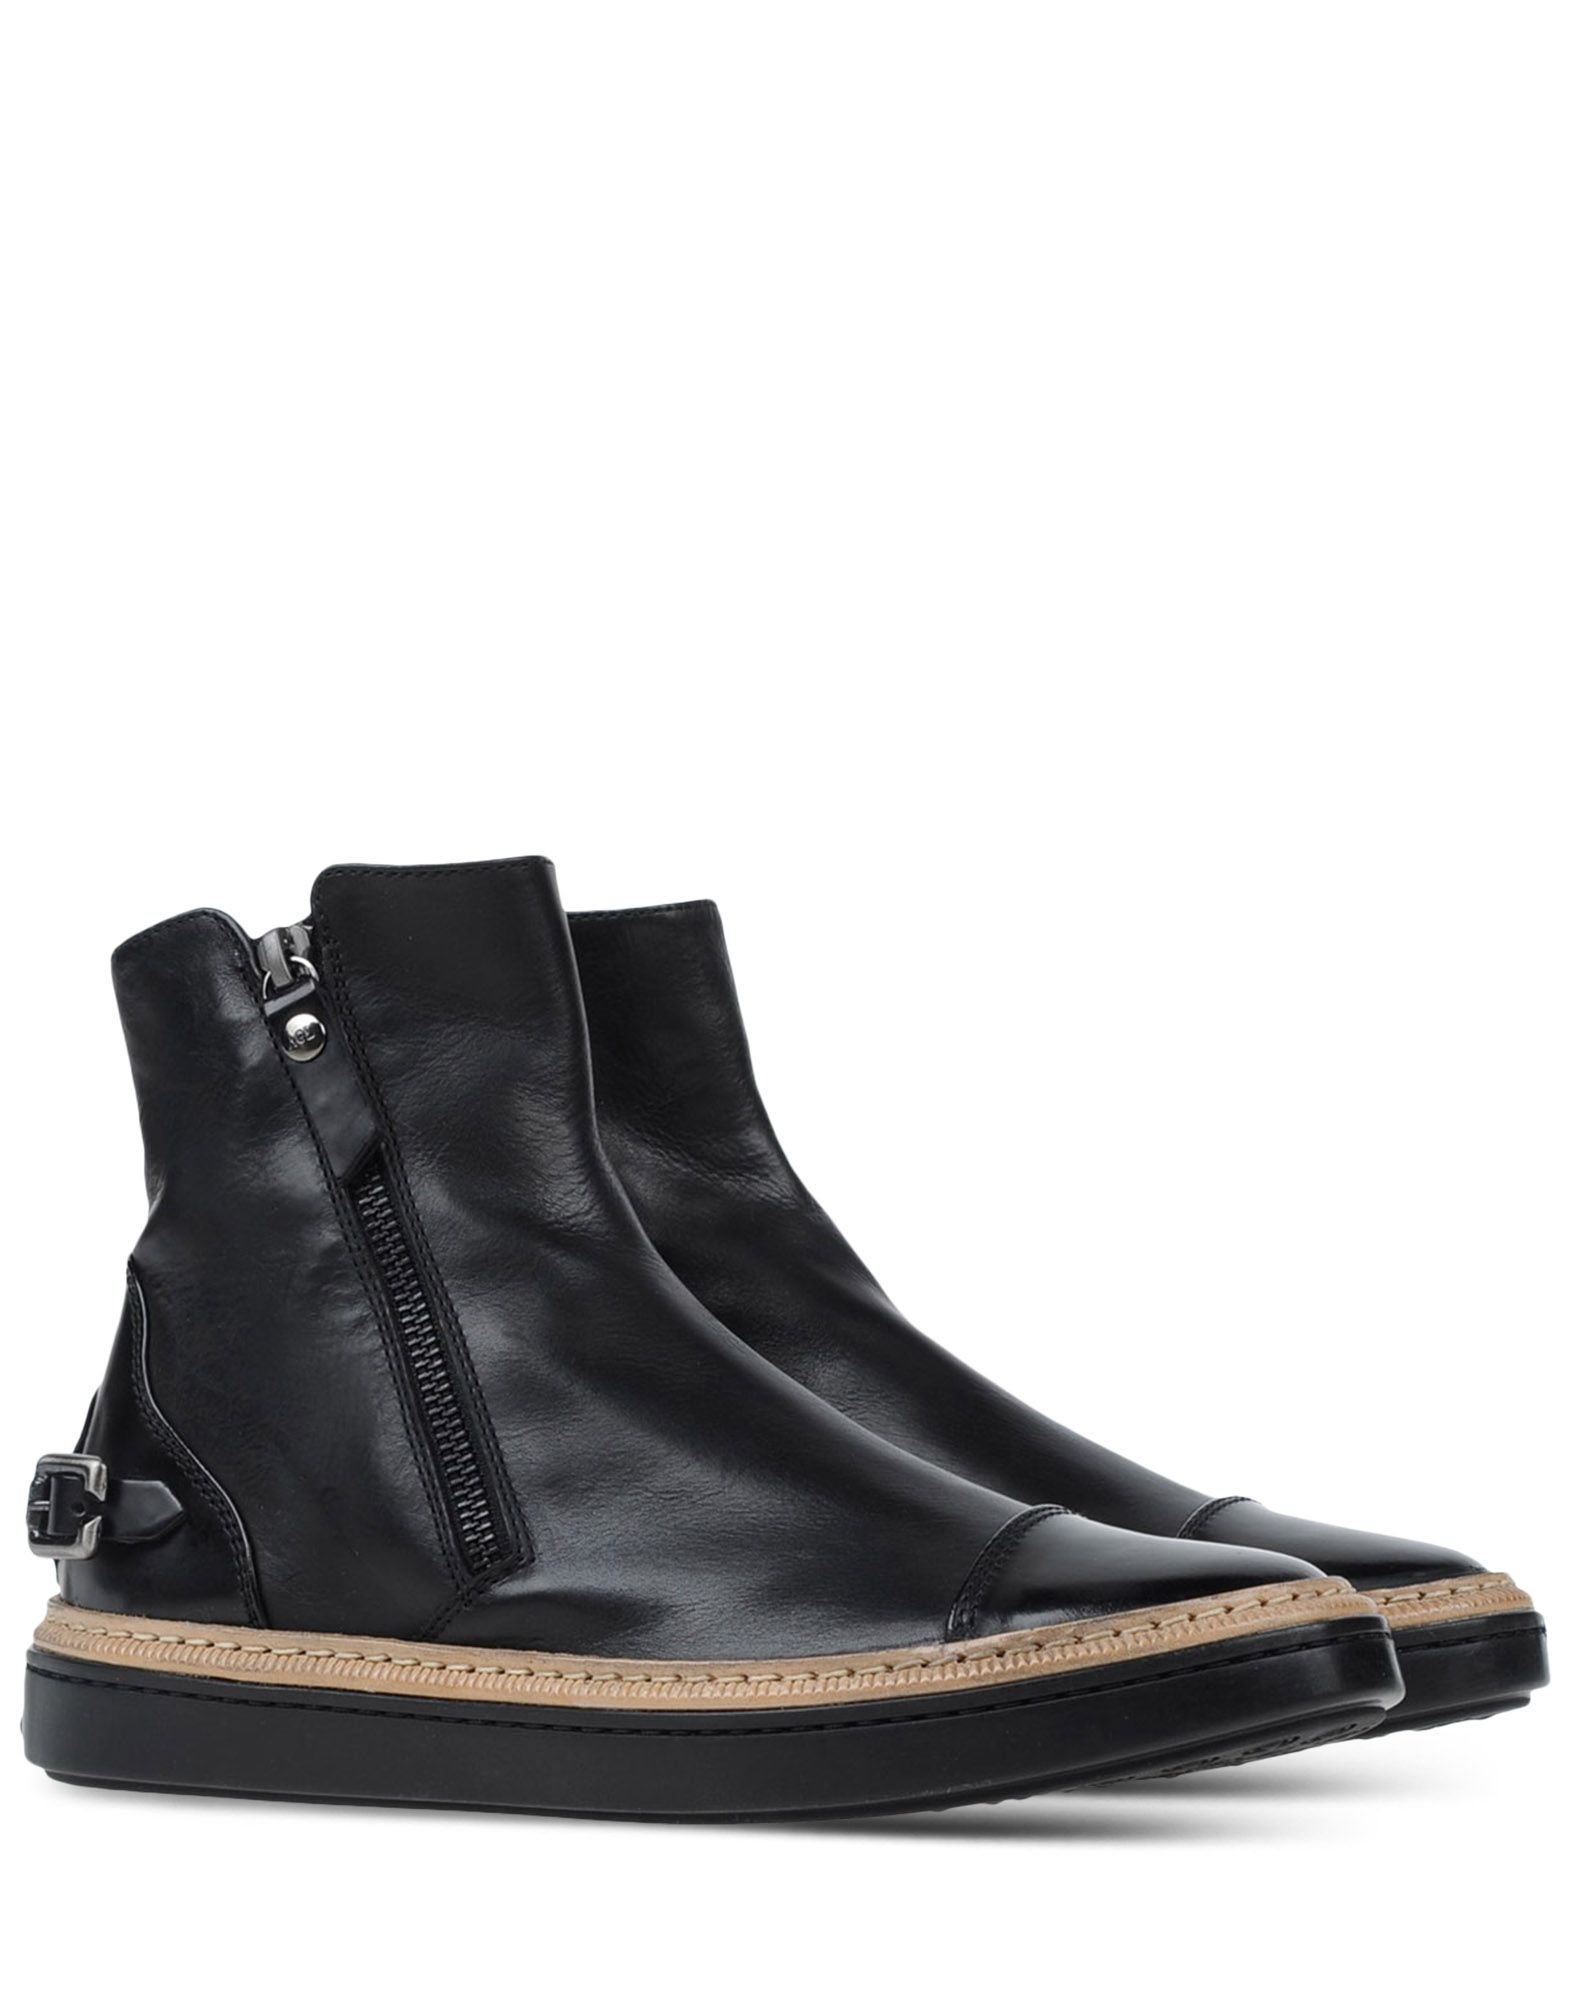 Agl Women S Shoes